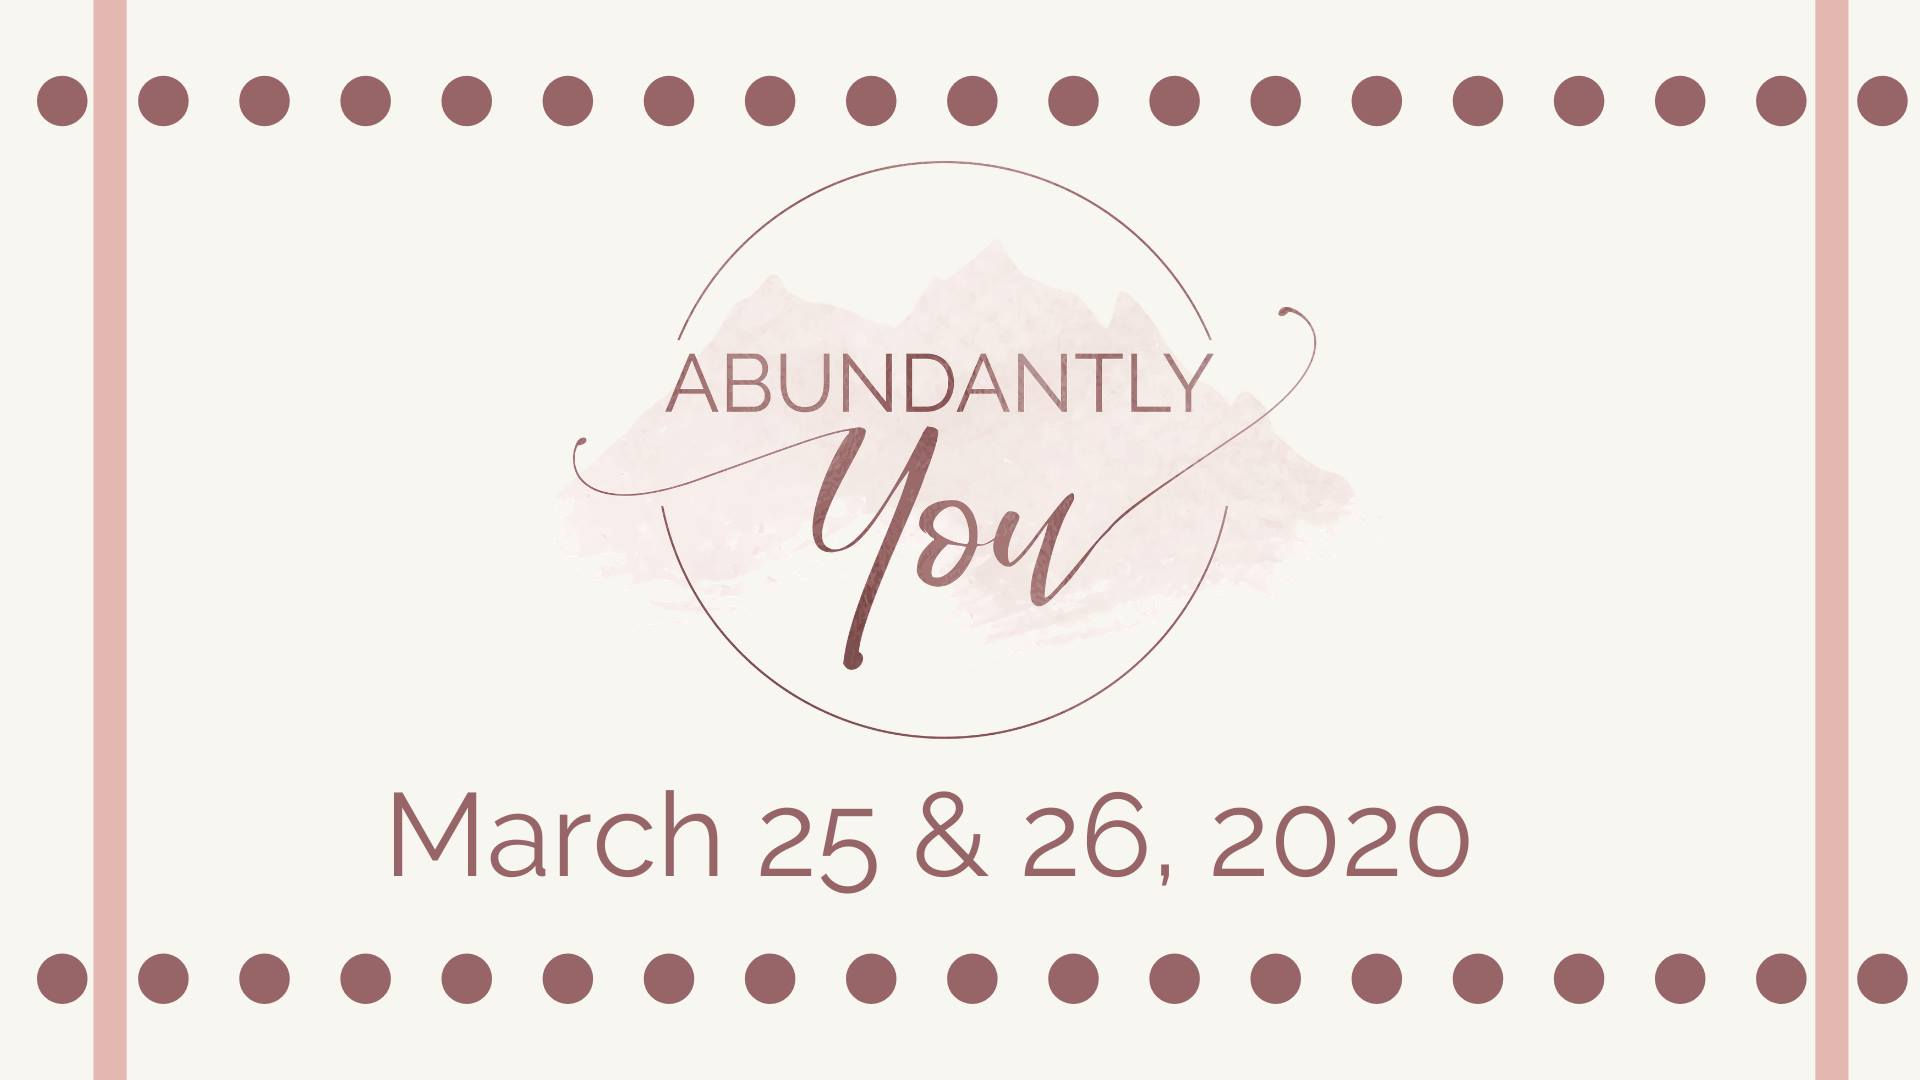 abundantly you conference